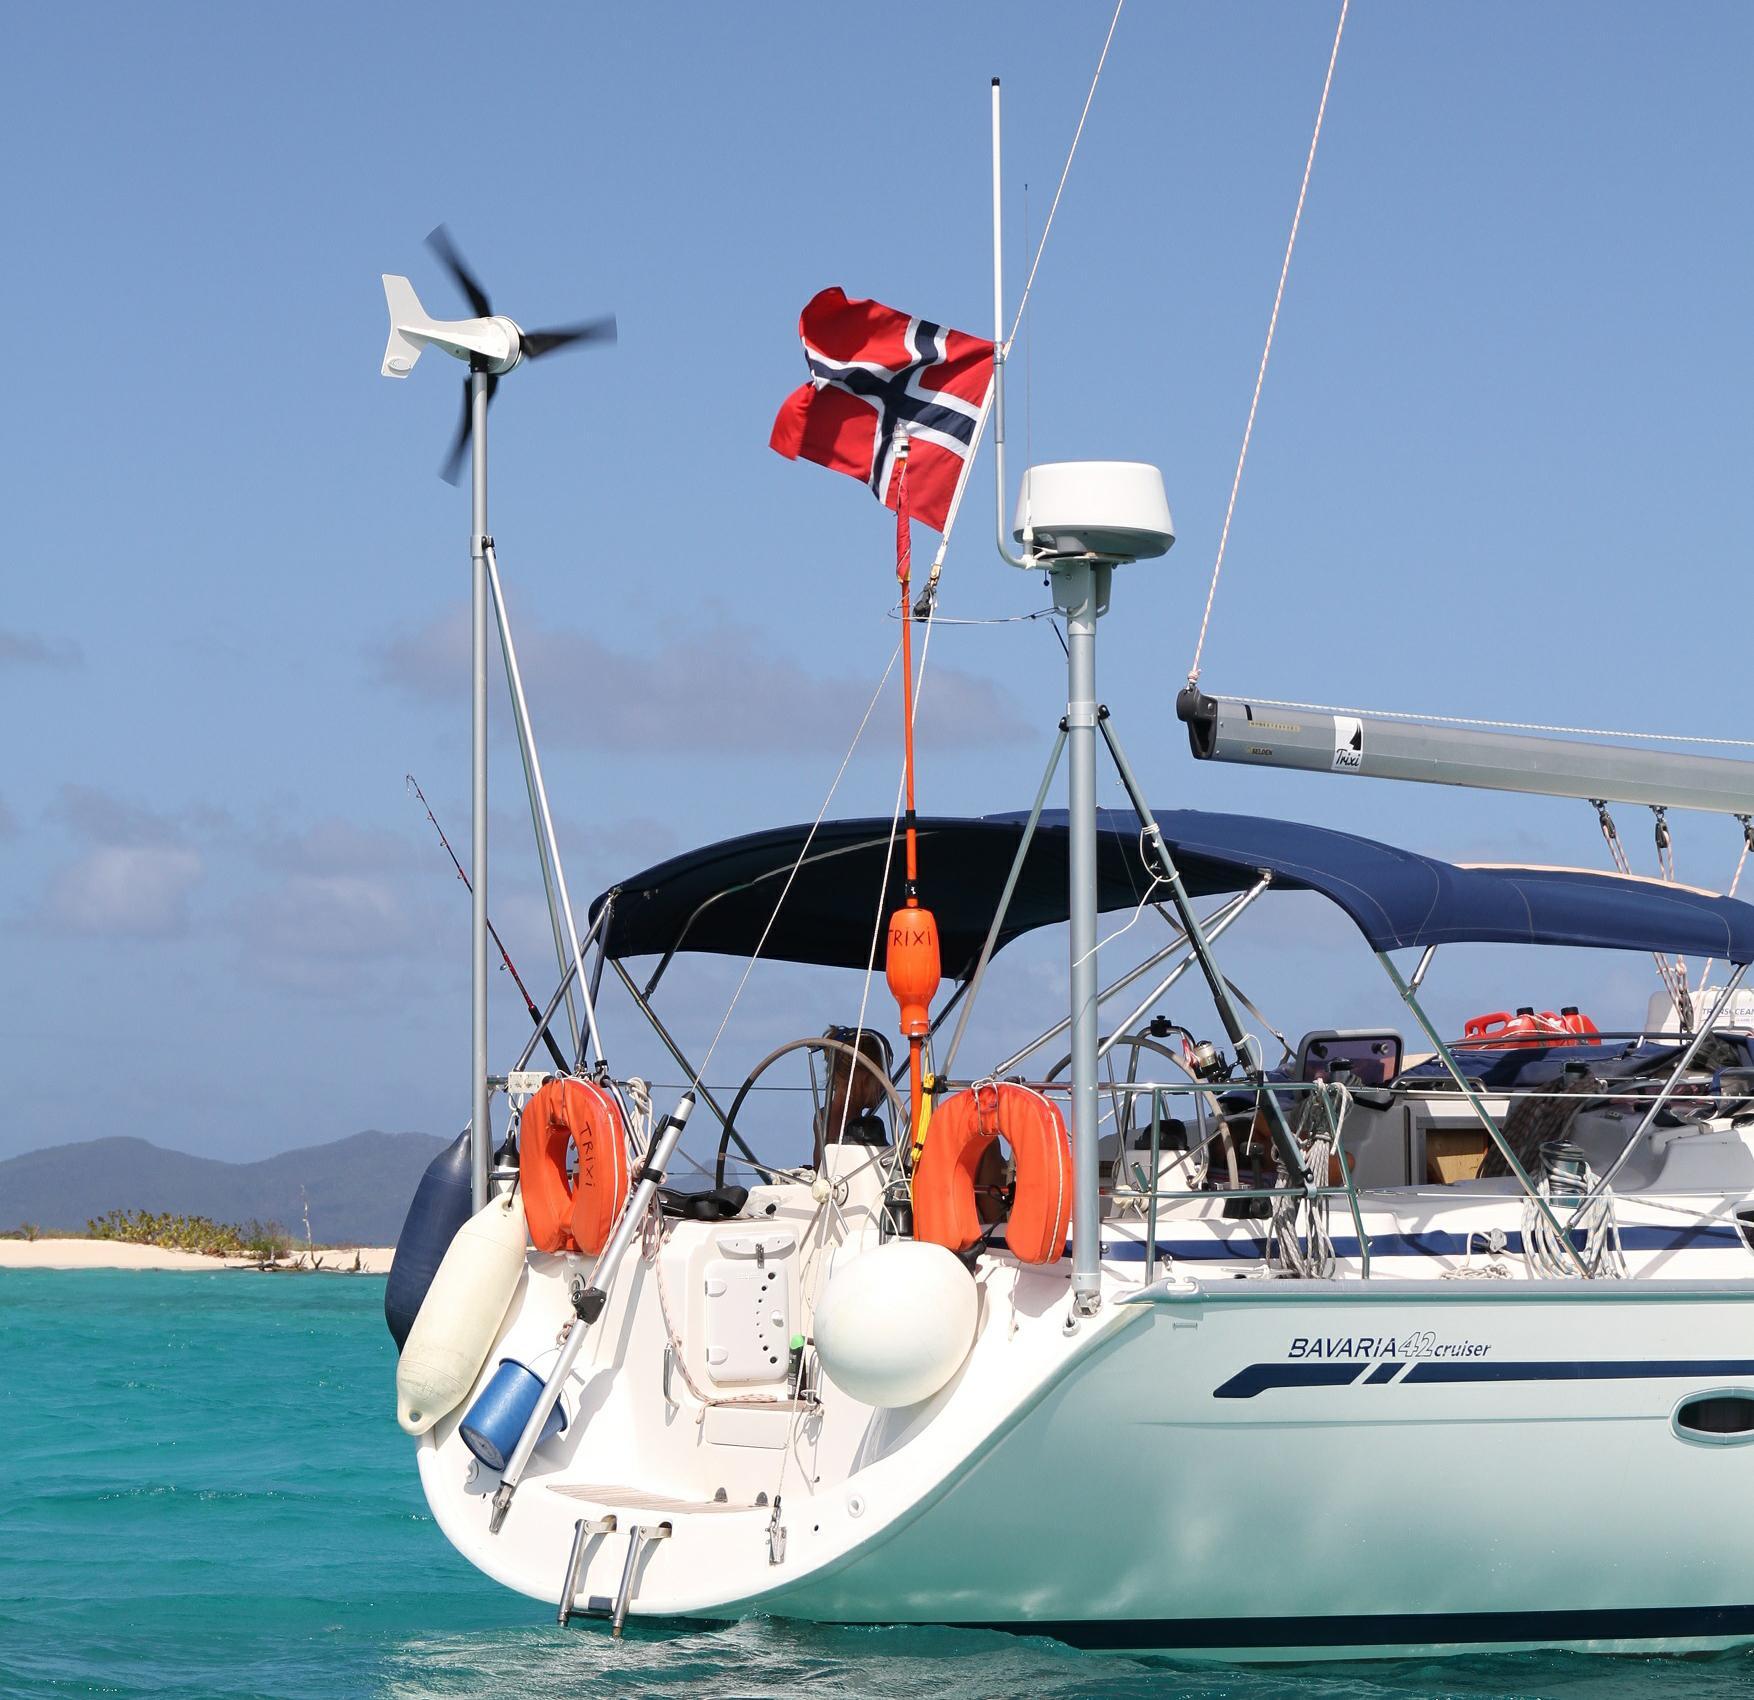 Marine Wind Generators for Sailing boats and Yachts